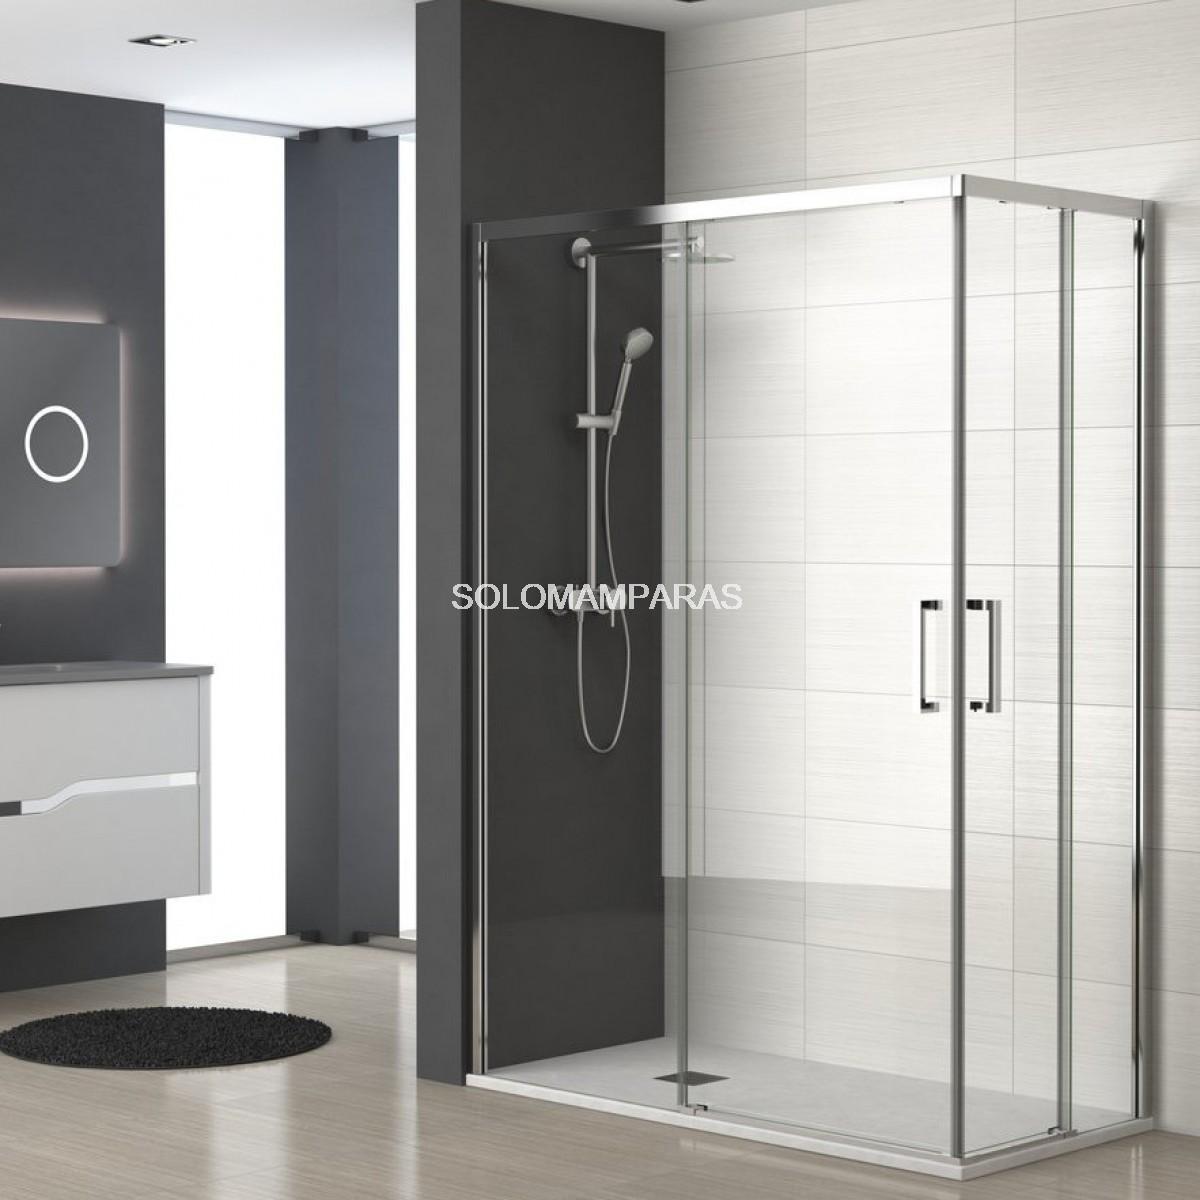 Mampara ducha sin perfil inferior lyon angular 2fijas for Mamparas de ducha correderas sin perfiles